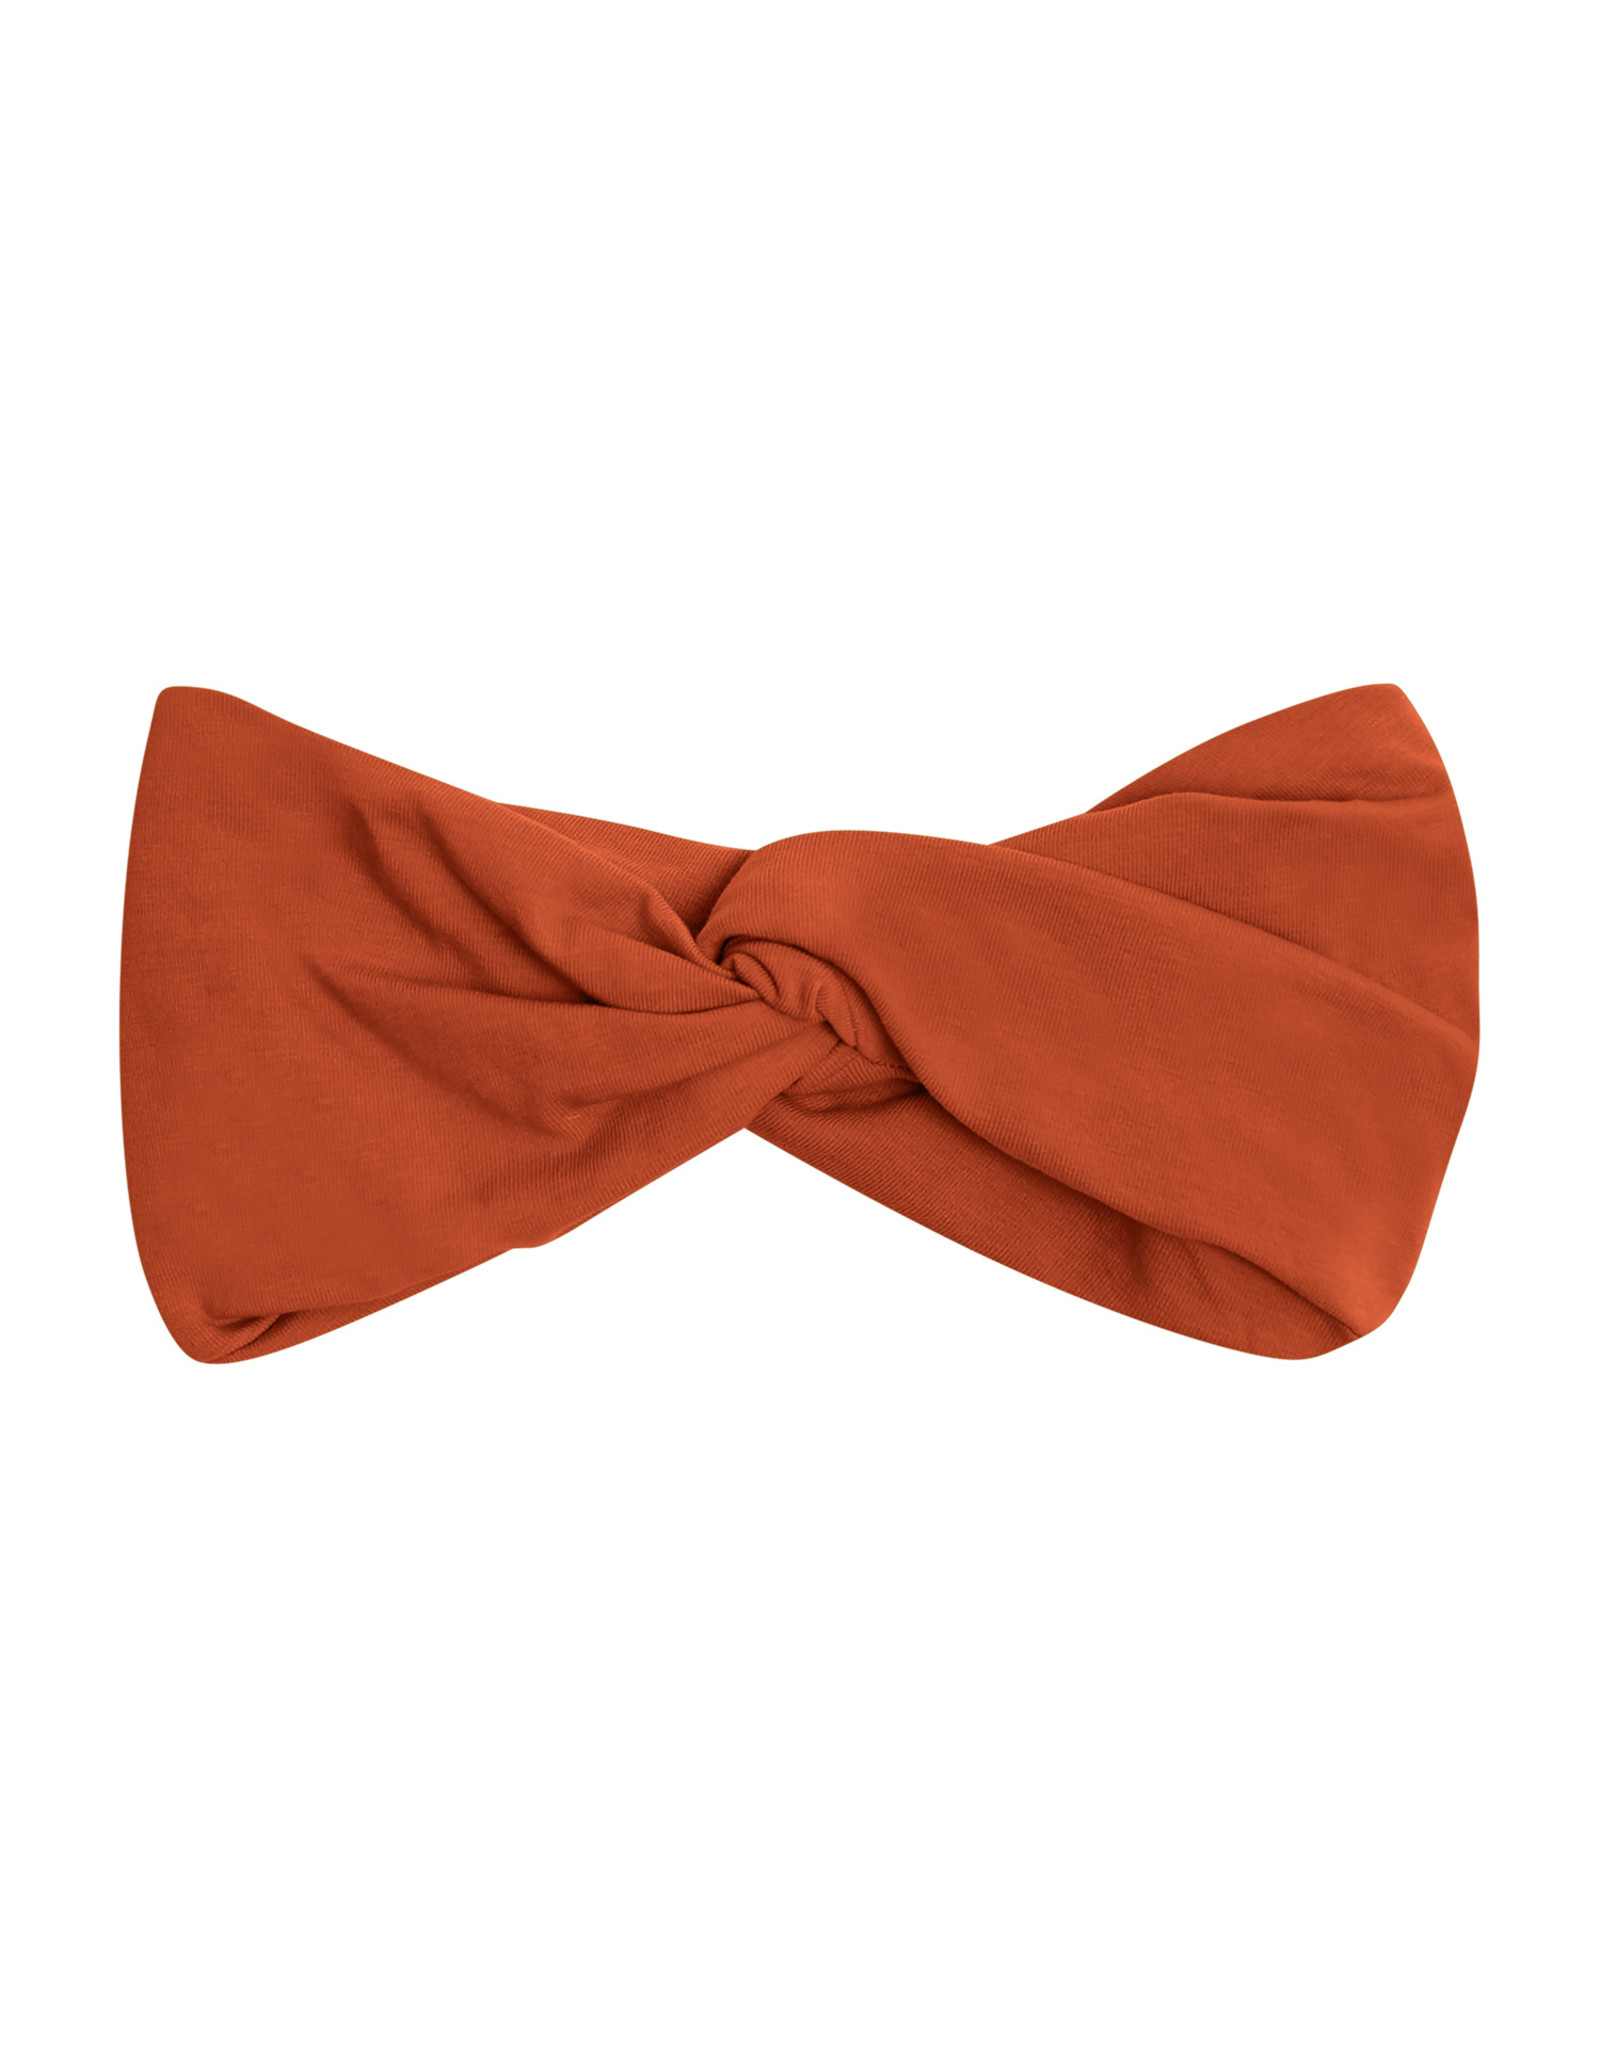 CarlijnQ Basics - headbands